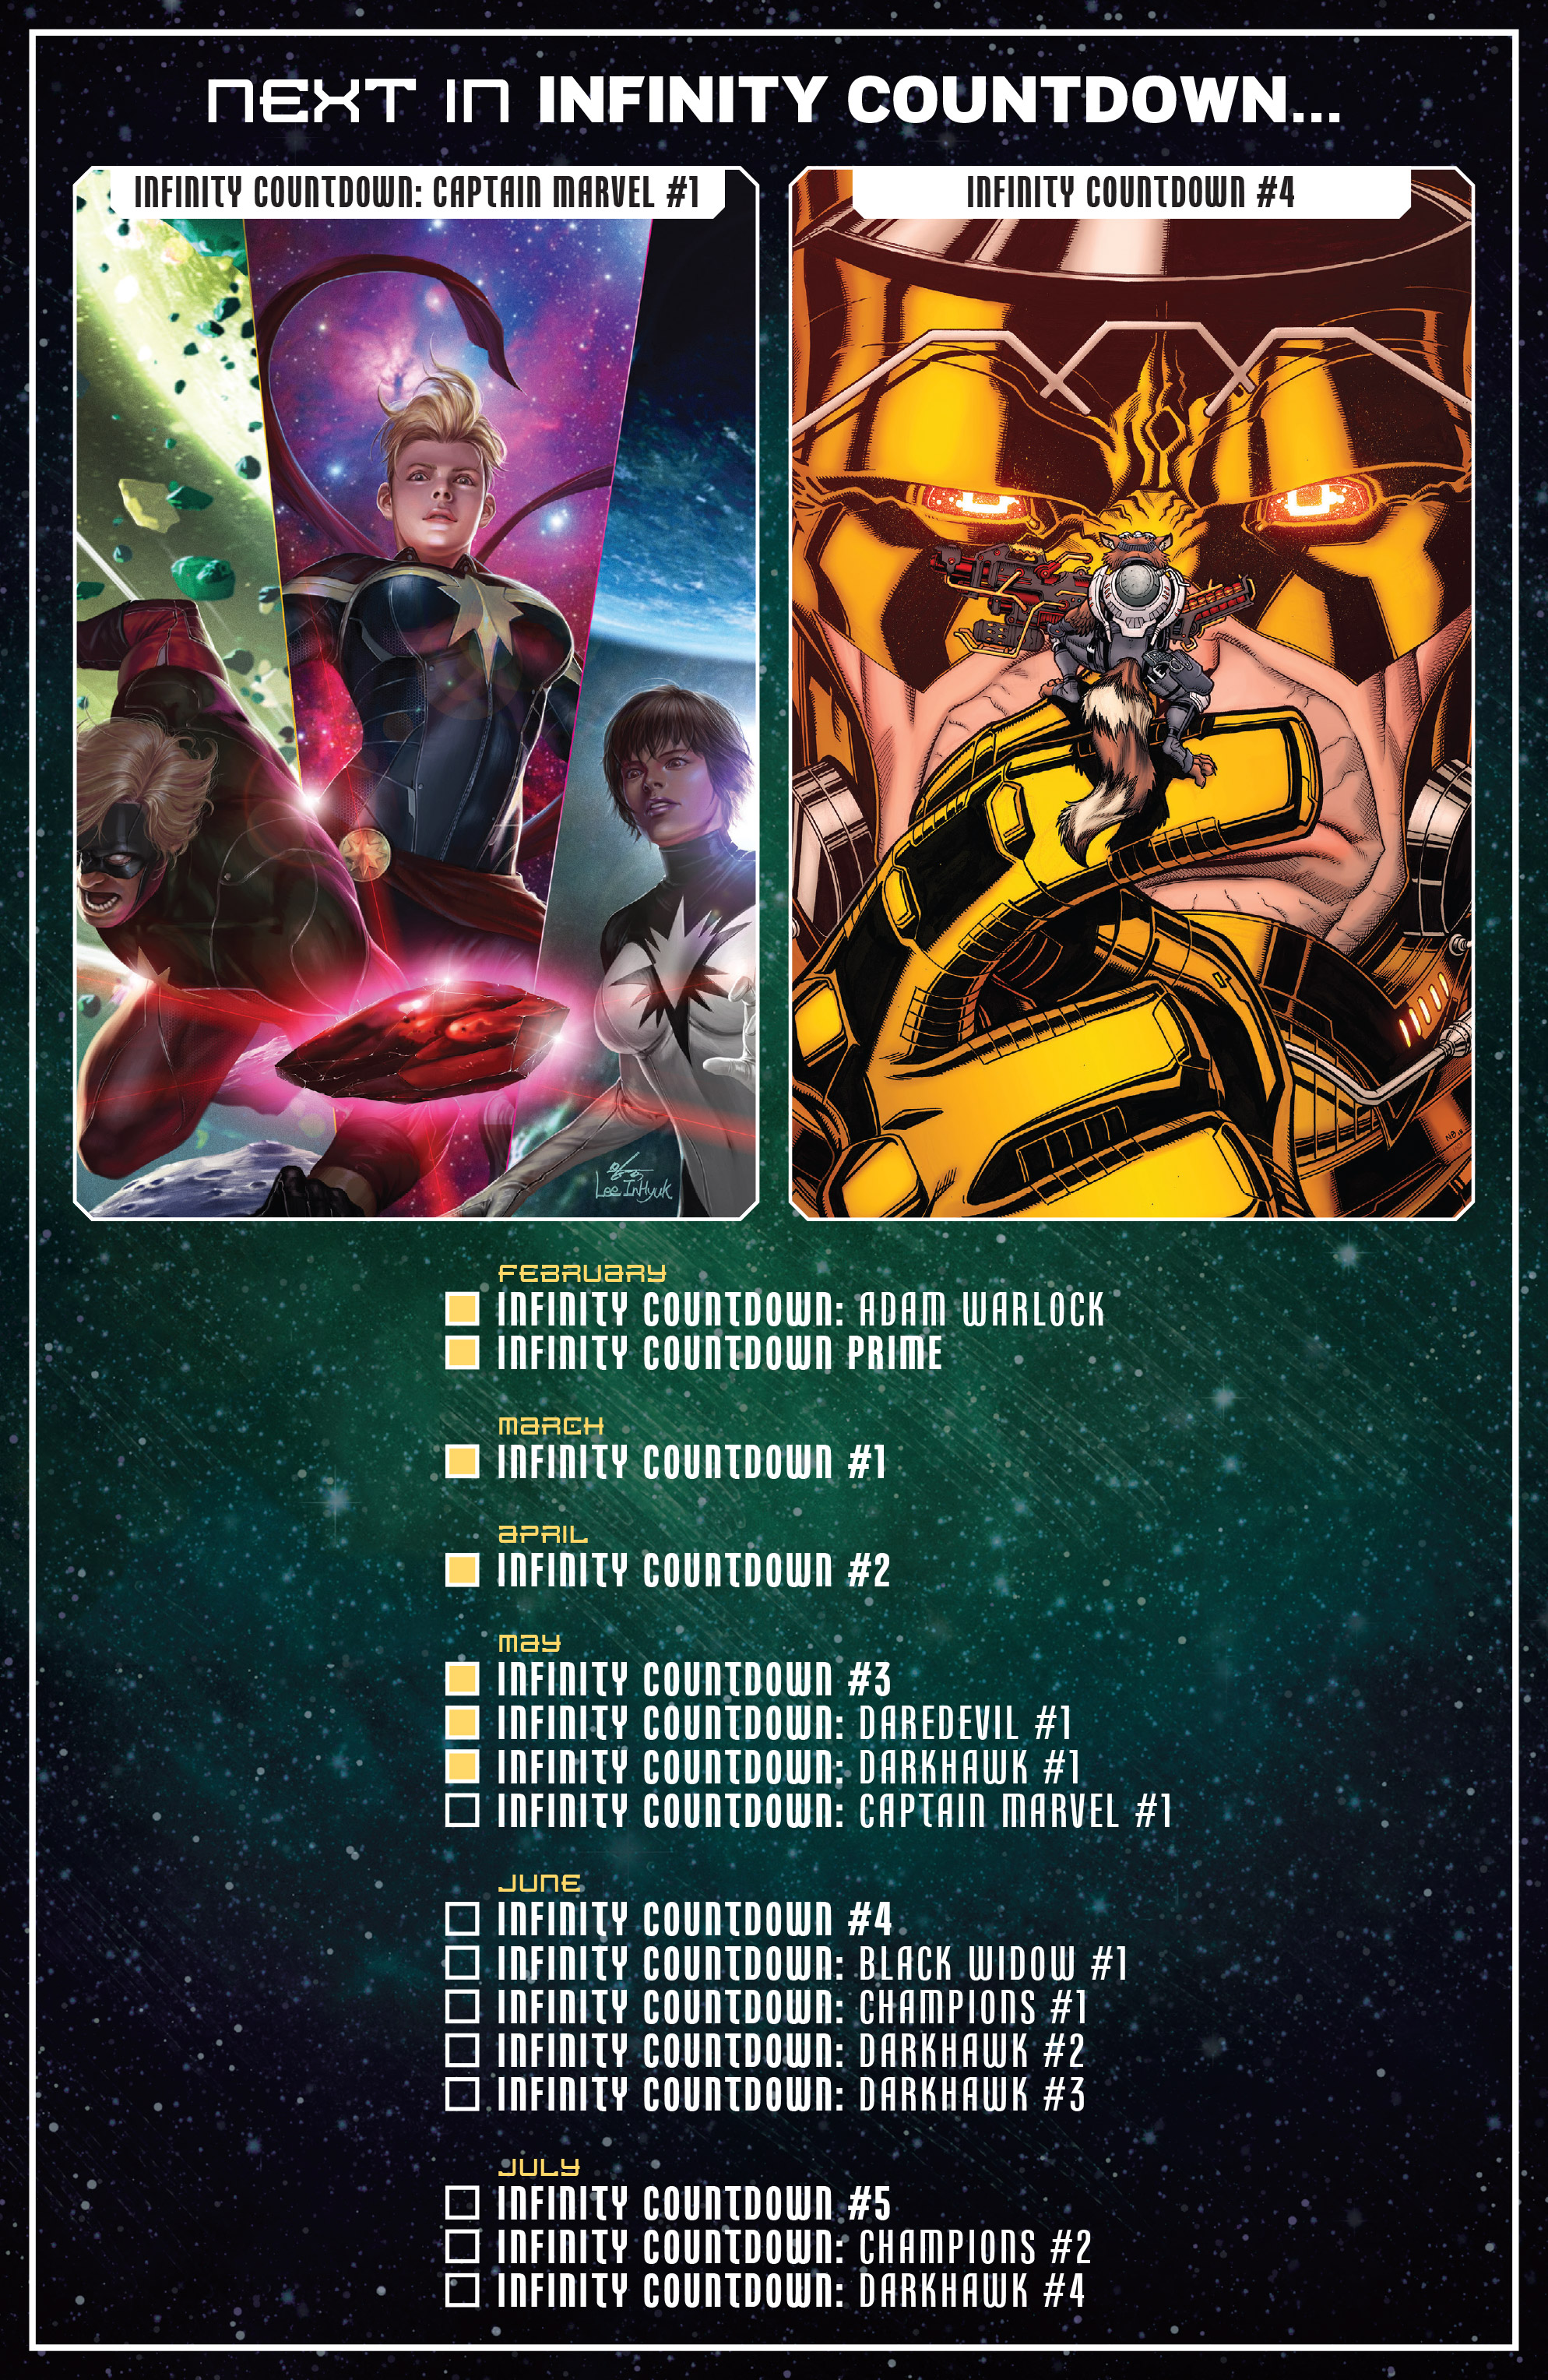 Infinity Countdown Darkhawk #2 Marvel Comics